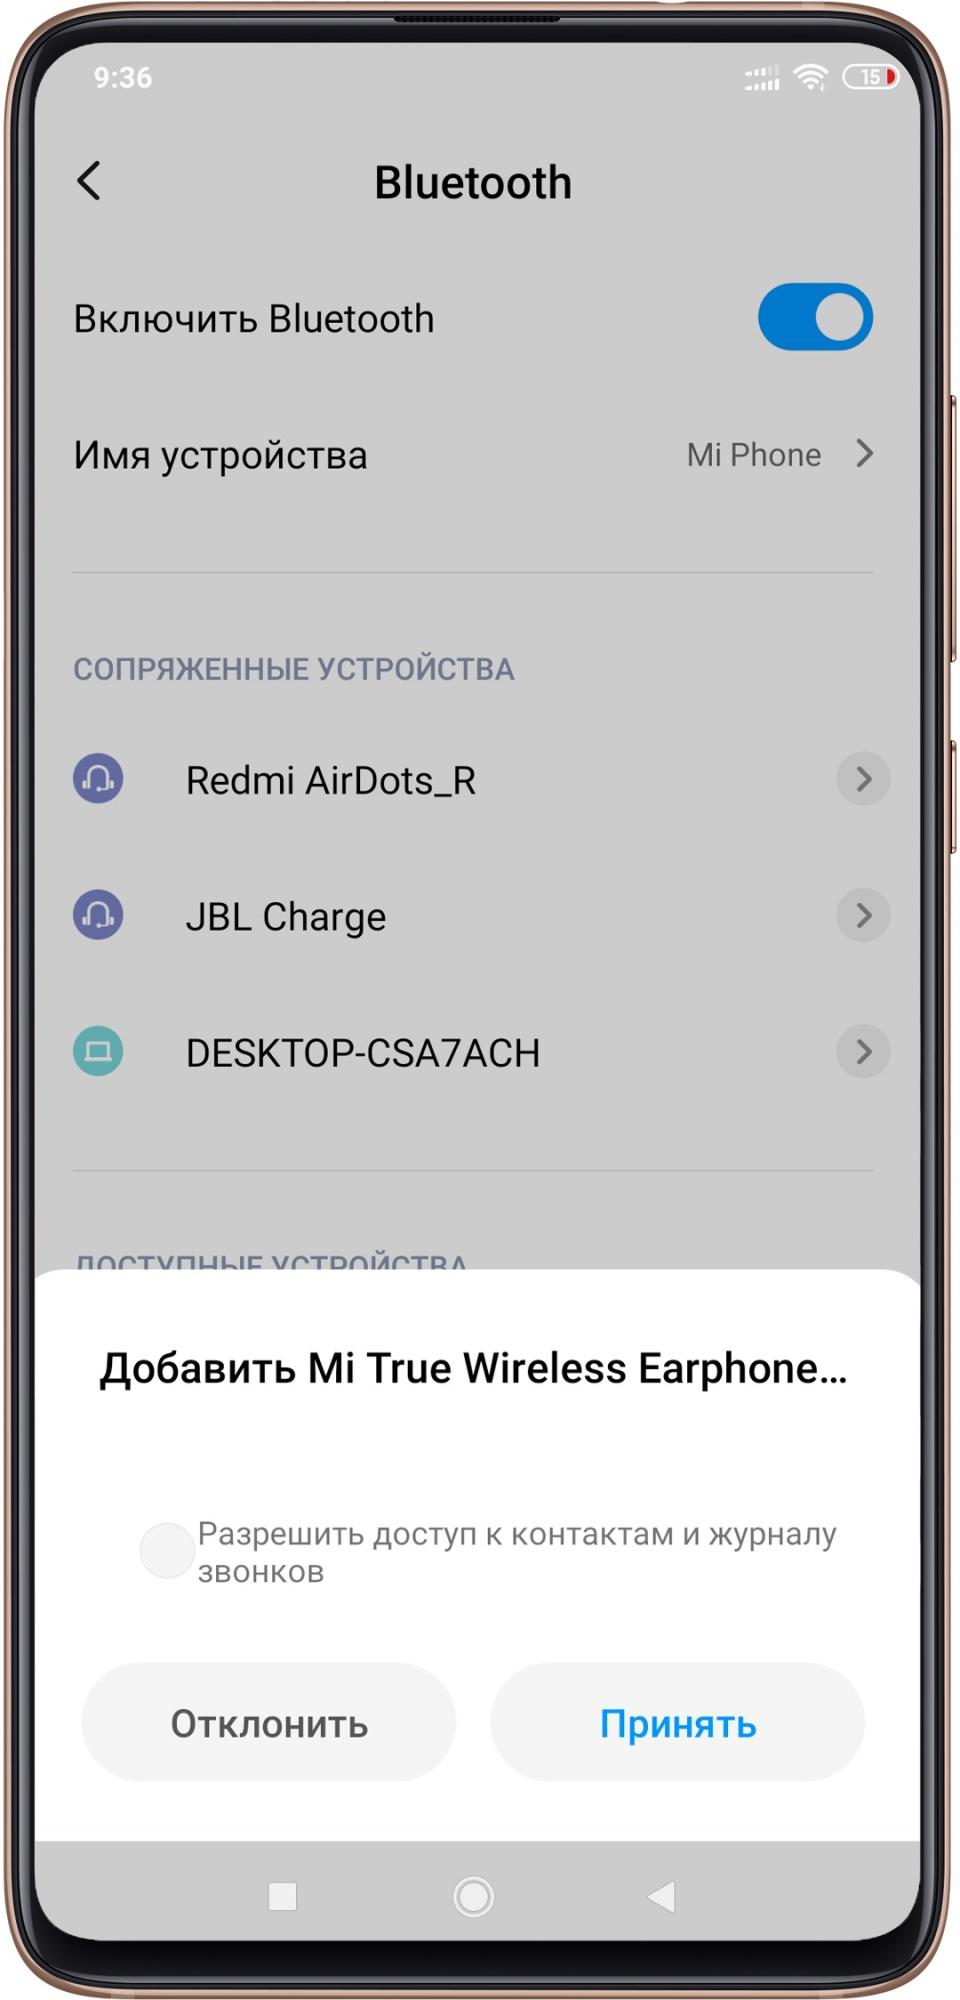 Выбираем Mi True Wireless Earphones 2 и нажимаем принять